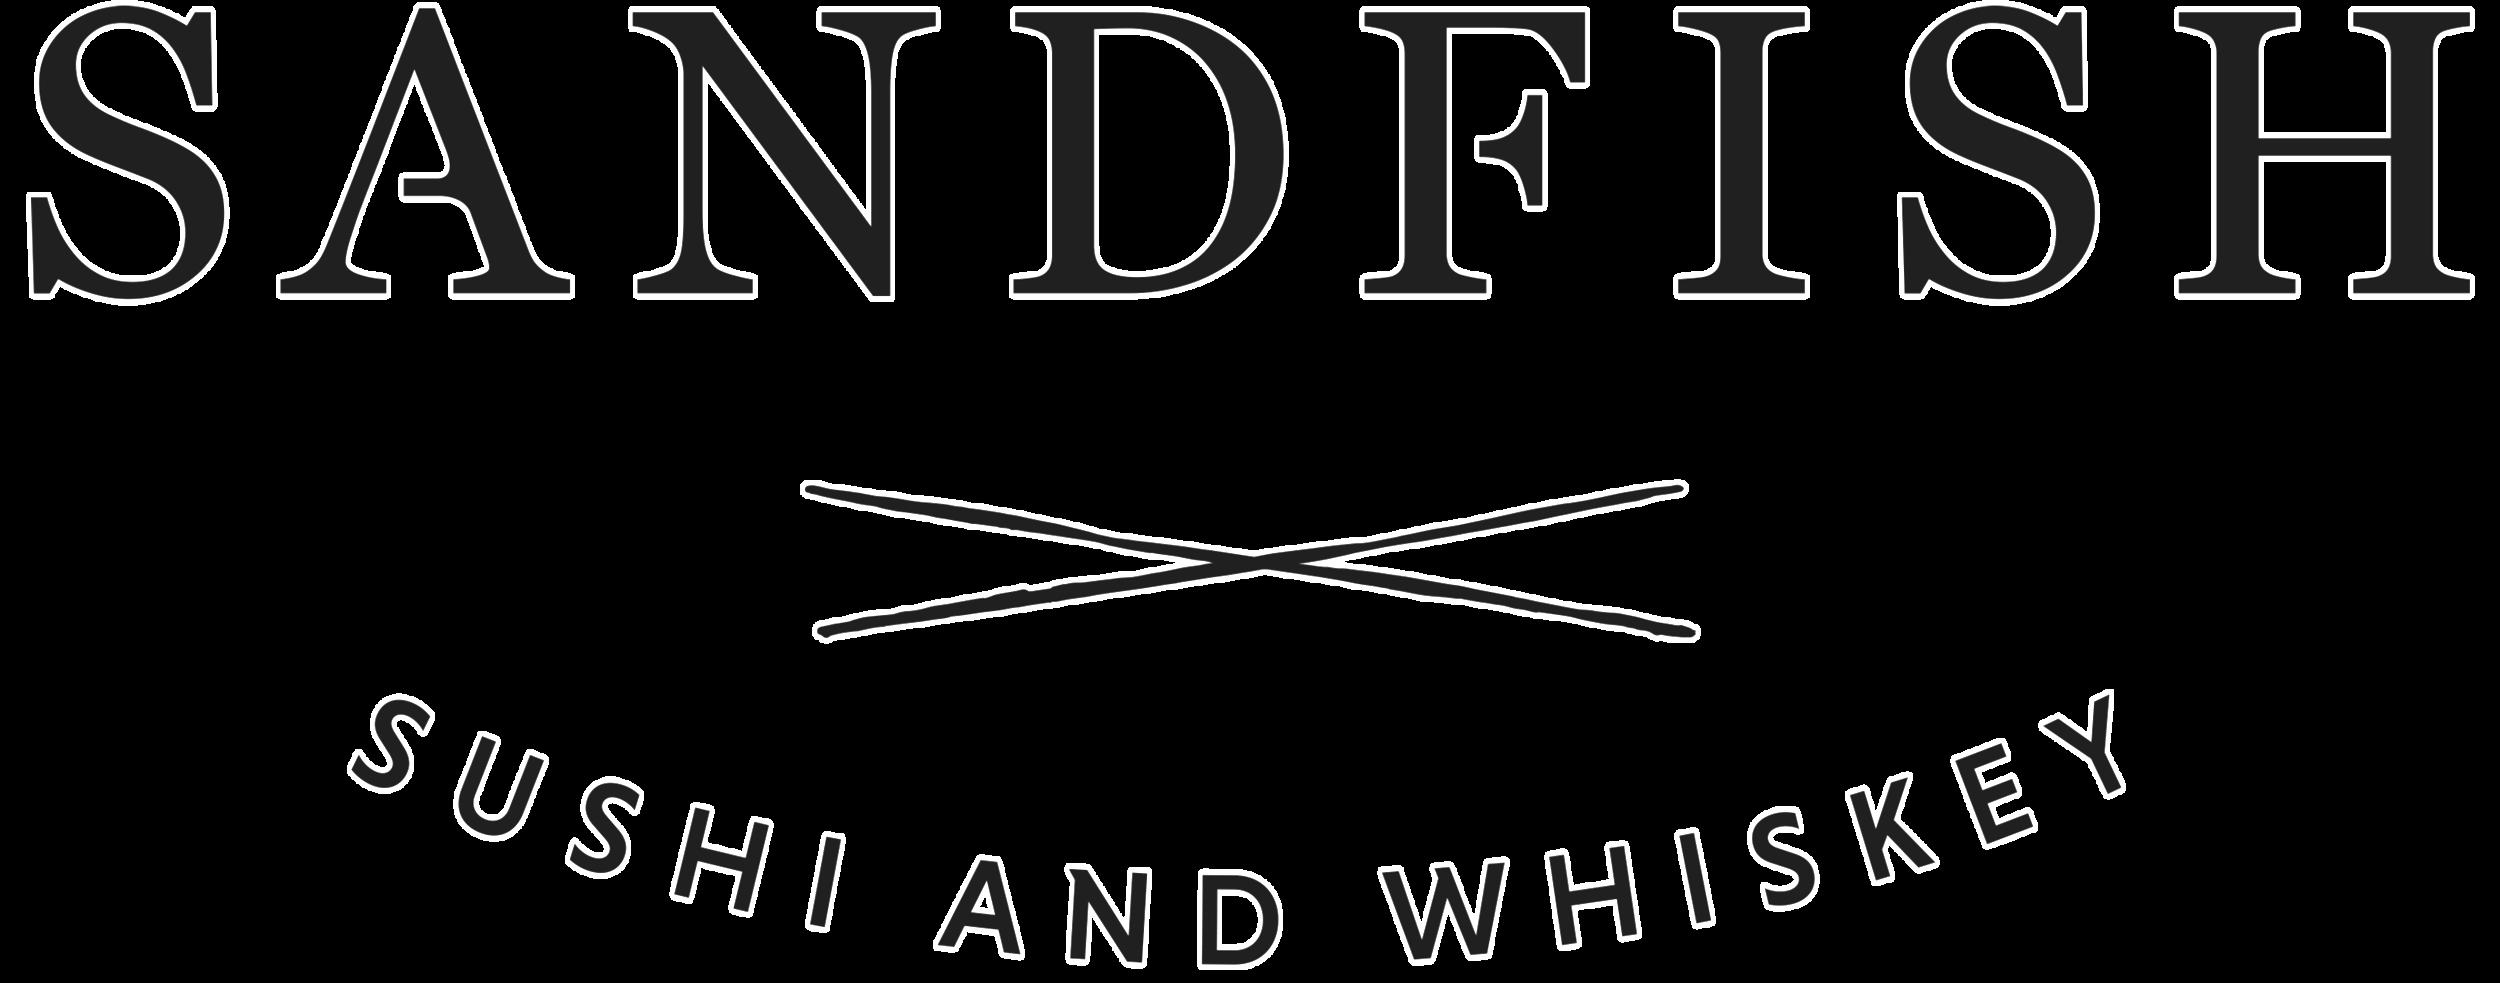 Sandfish_logo.png